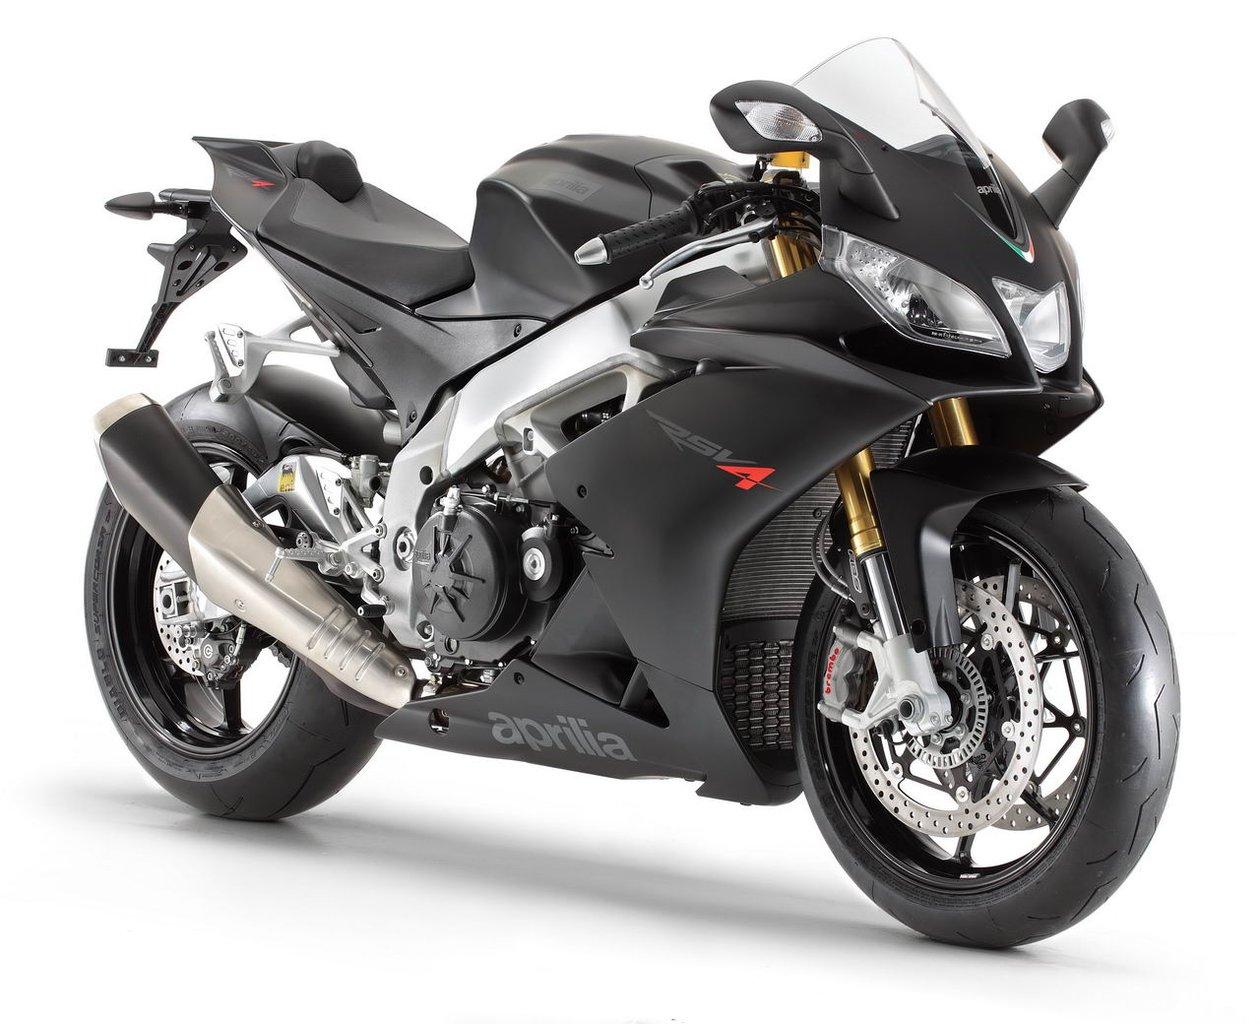 Listino Aprilia SX 125 Moto 50 e 125 - image 14321_aprilia-rsv4r-abs on http://moto.motori.net